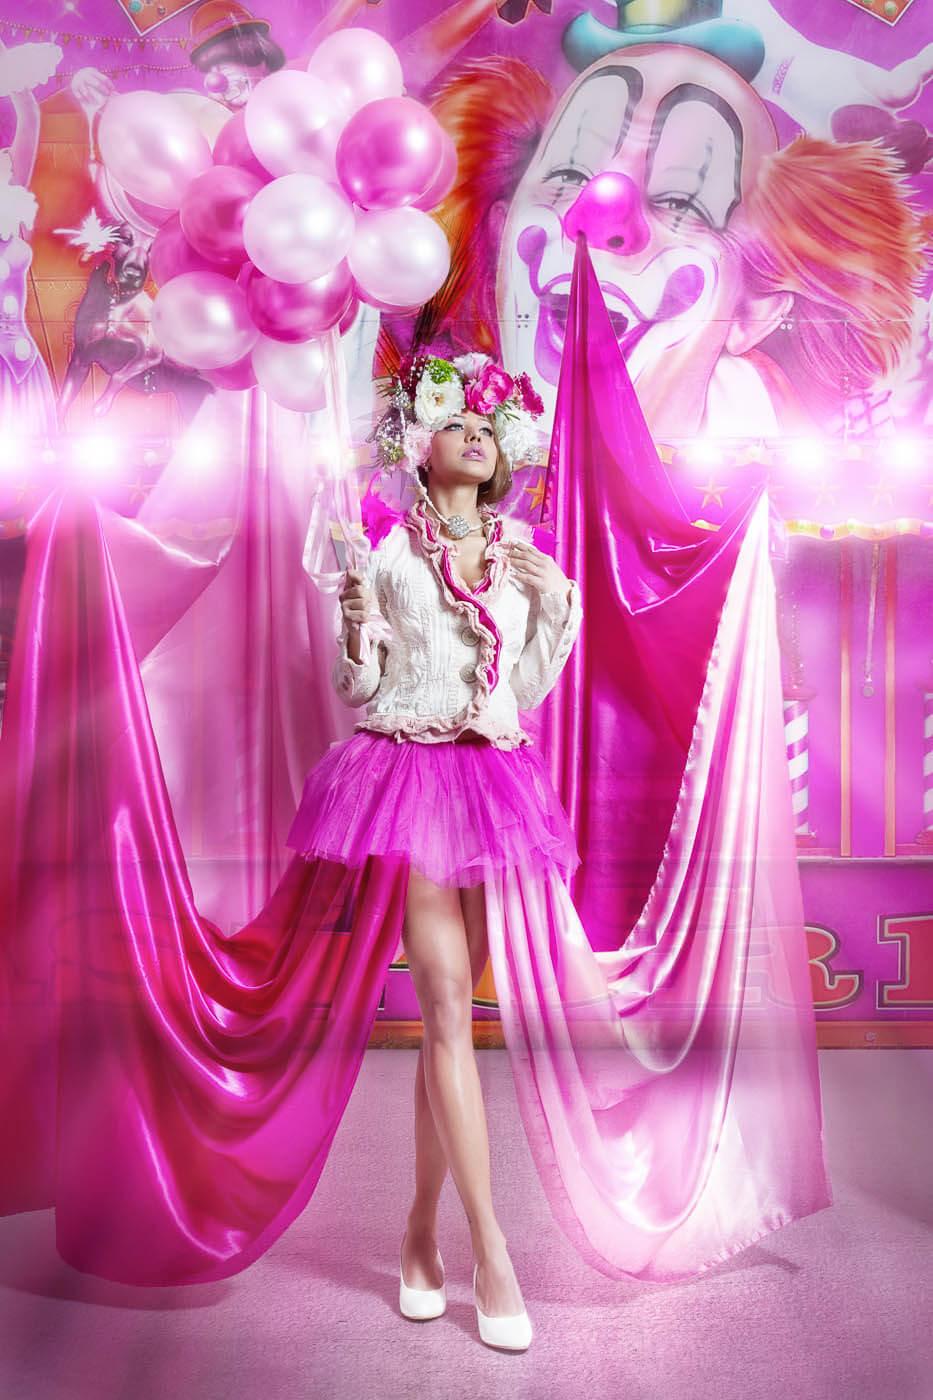 Vollportrait-Fotograf-Fotostudio-Dresden-Blumen-Styling-Elegant-Kleid-Kopfschmuck-Luftballons